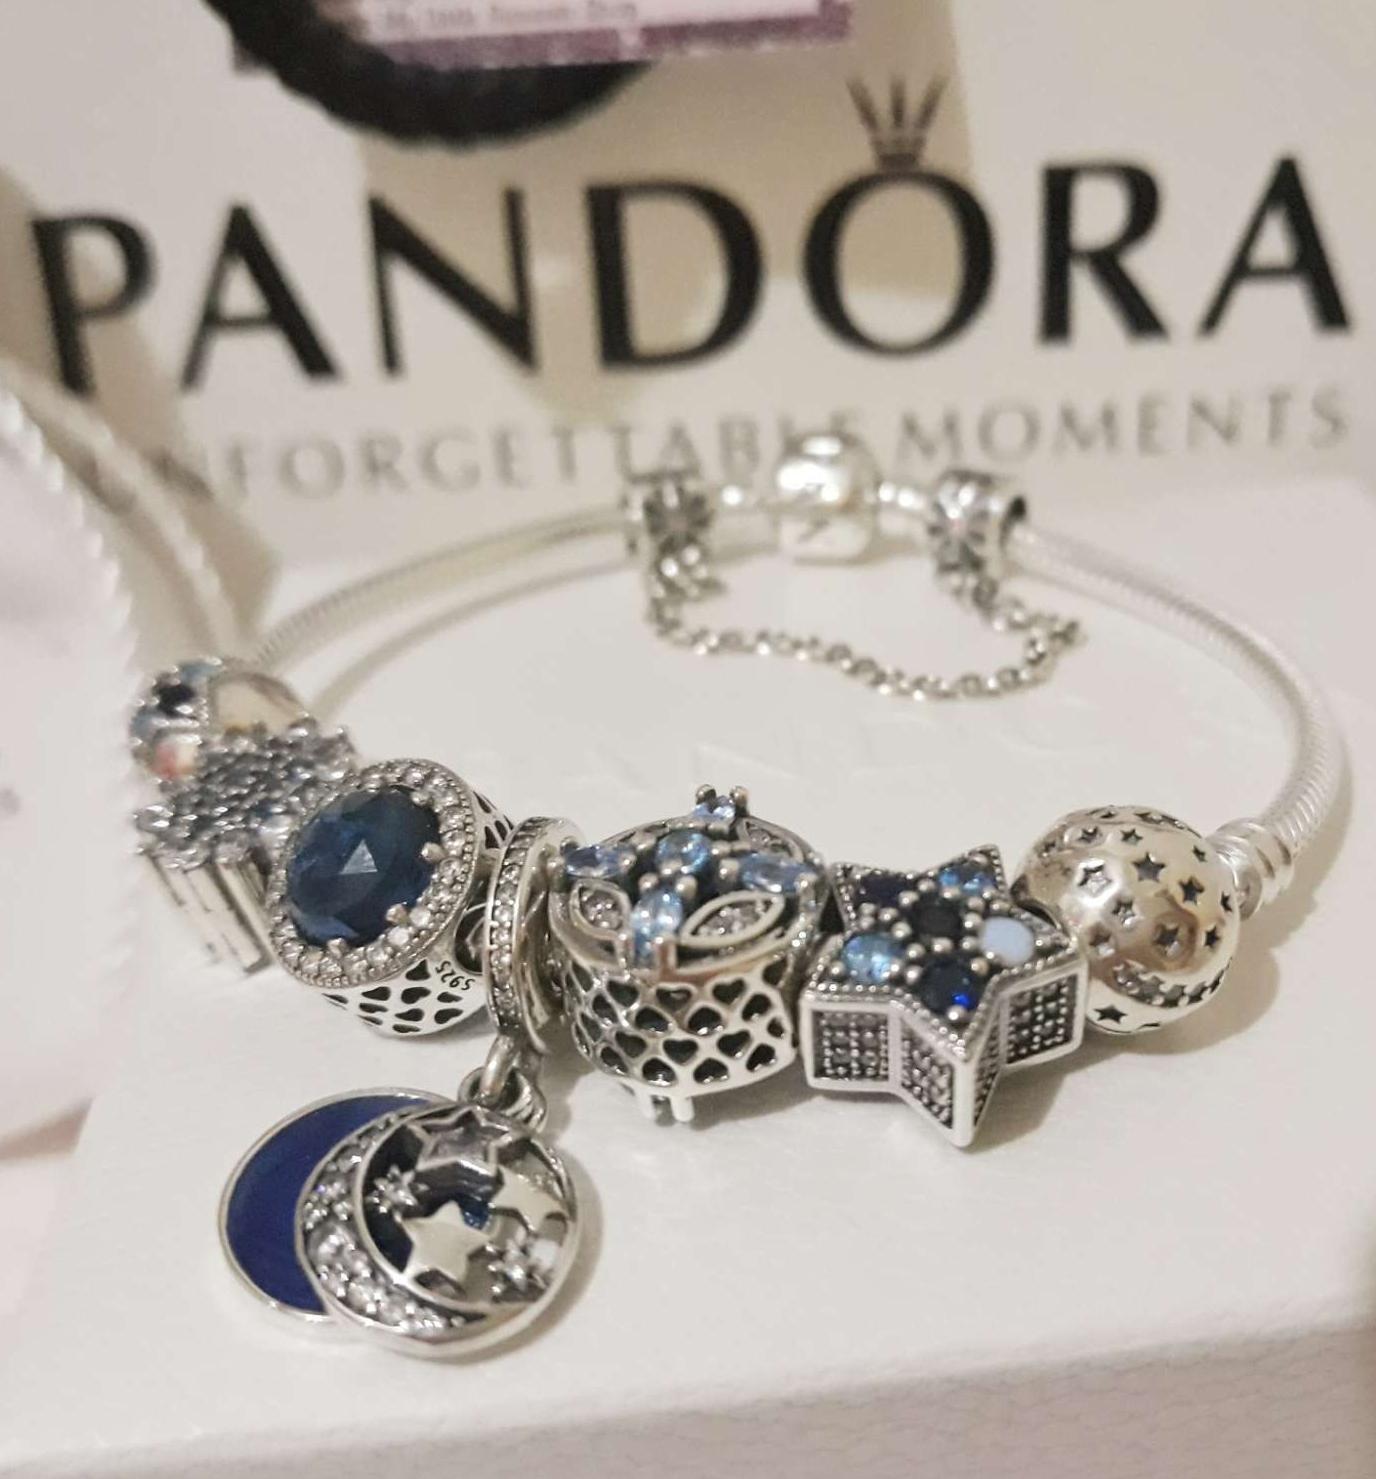 Pandora Jewelry Philippines Pandora Jewelry Accessories For Sale